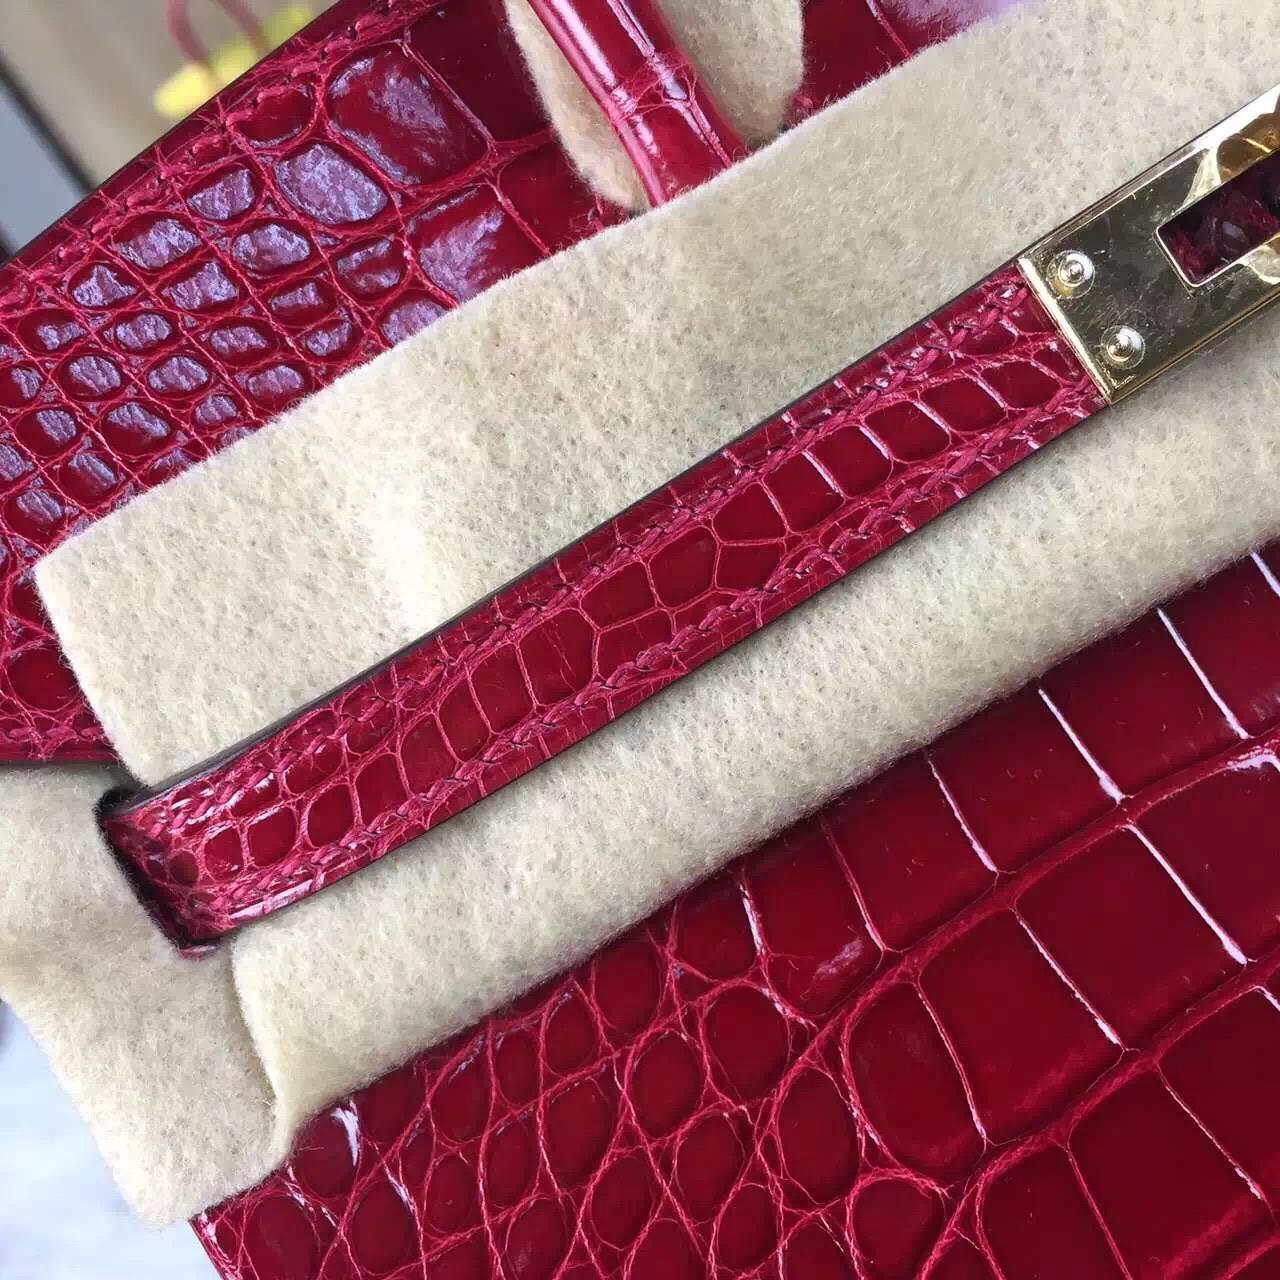 High Quality Hermes HCP Crocodile Skin Leather Birkin Bag25cm in Chinese Red